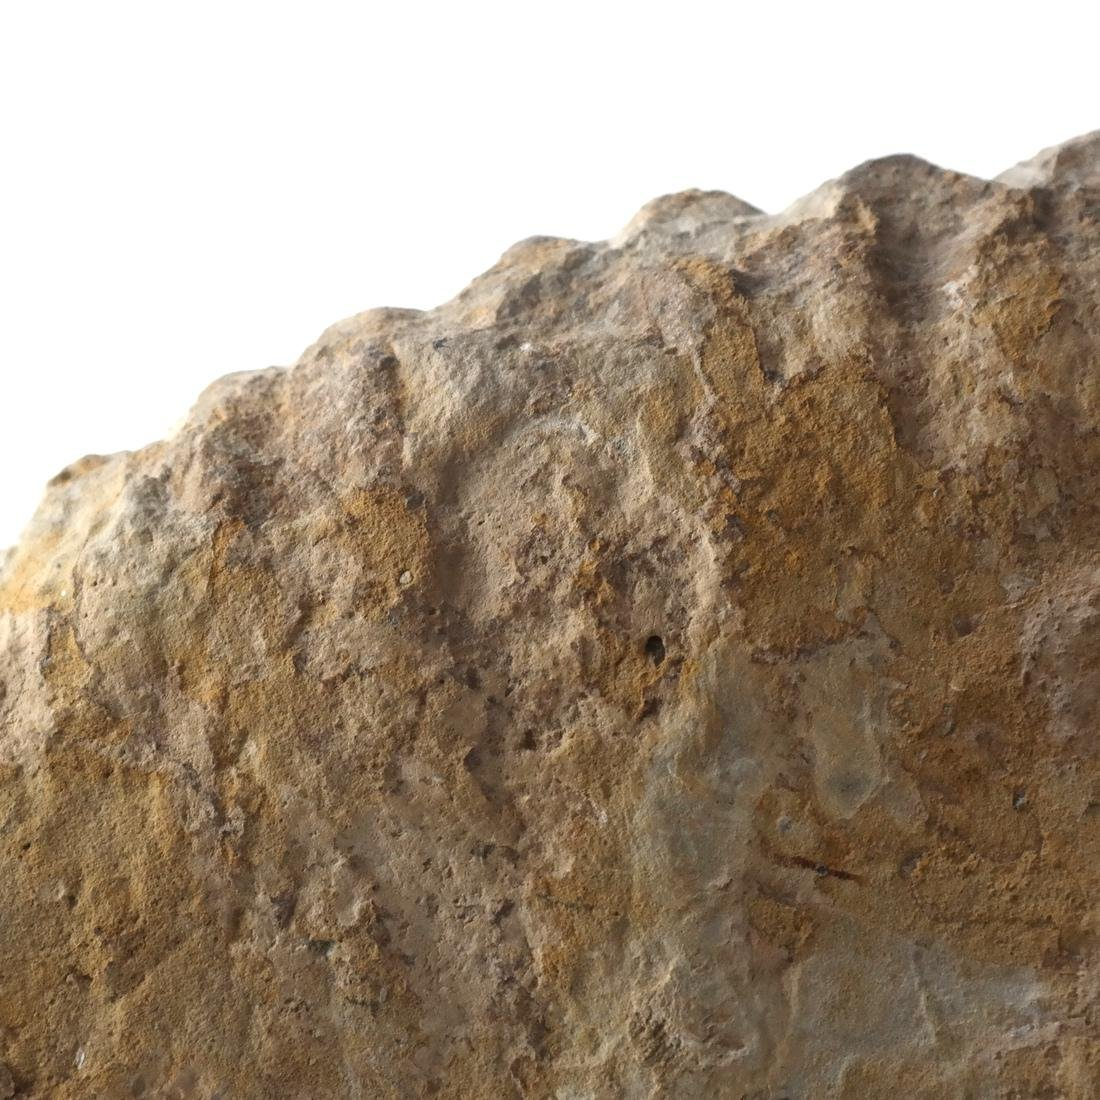 Fossilized Ammonite Specimen - 6